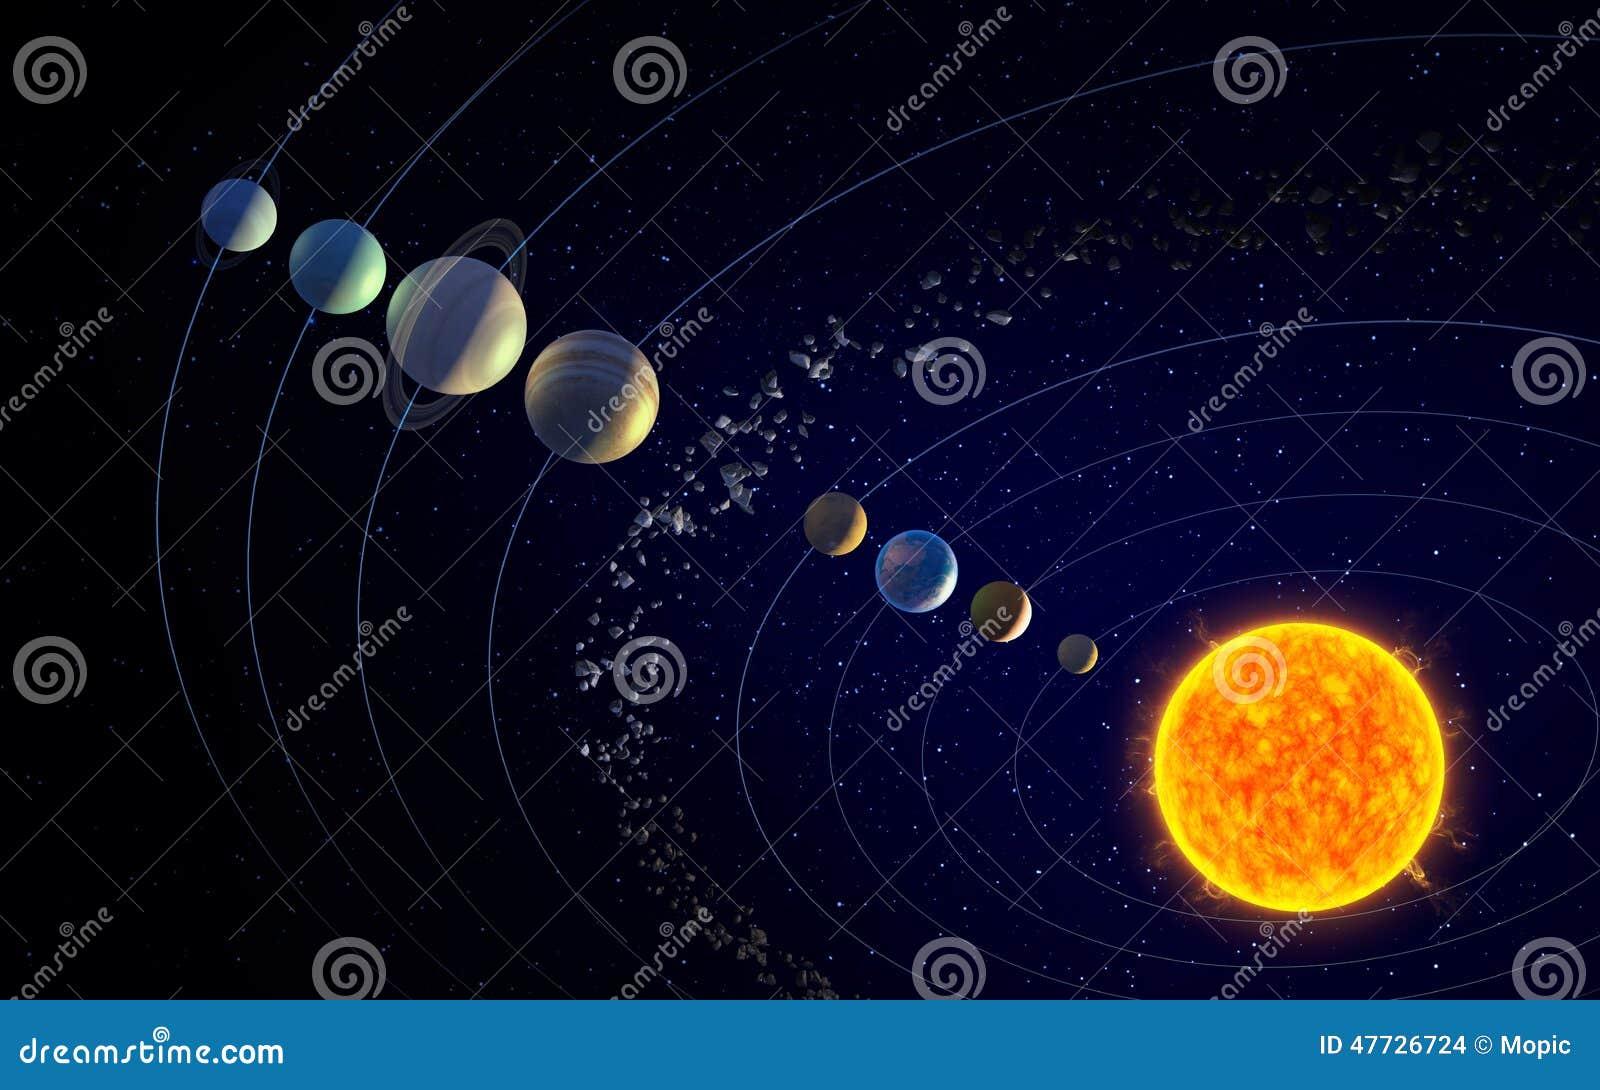 its nine planets and sun - photo #42